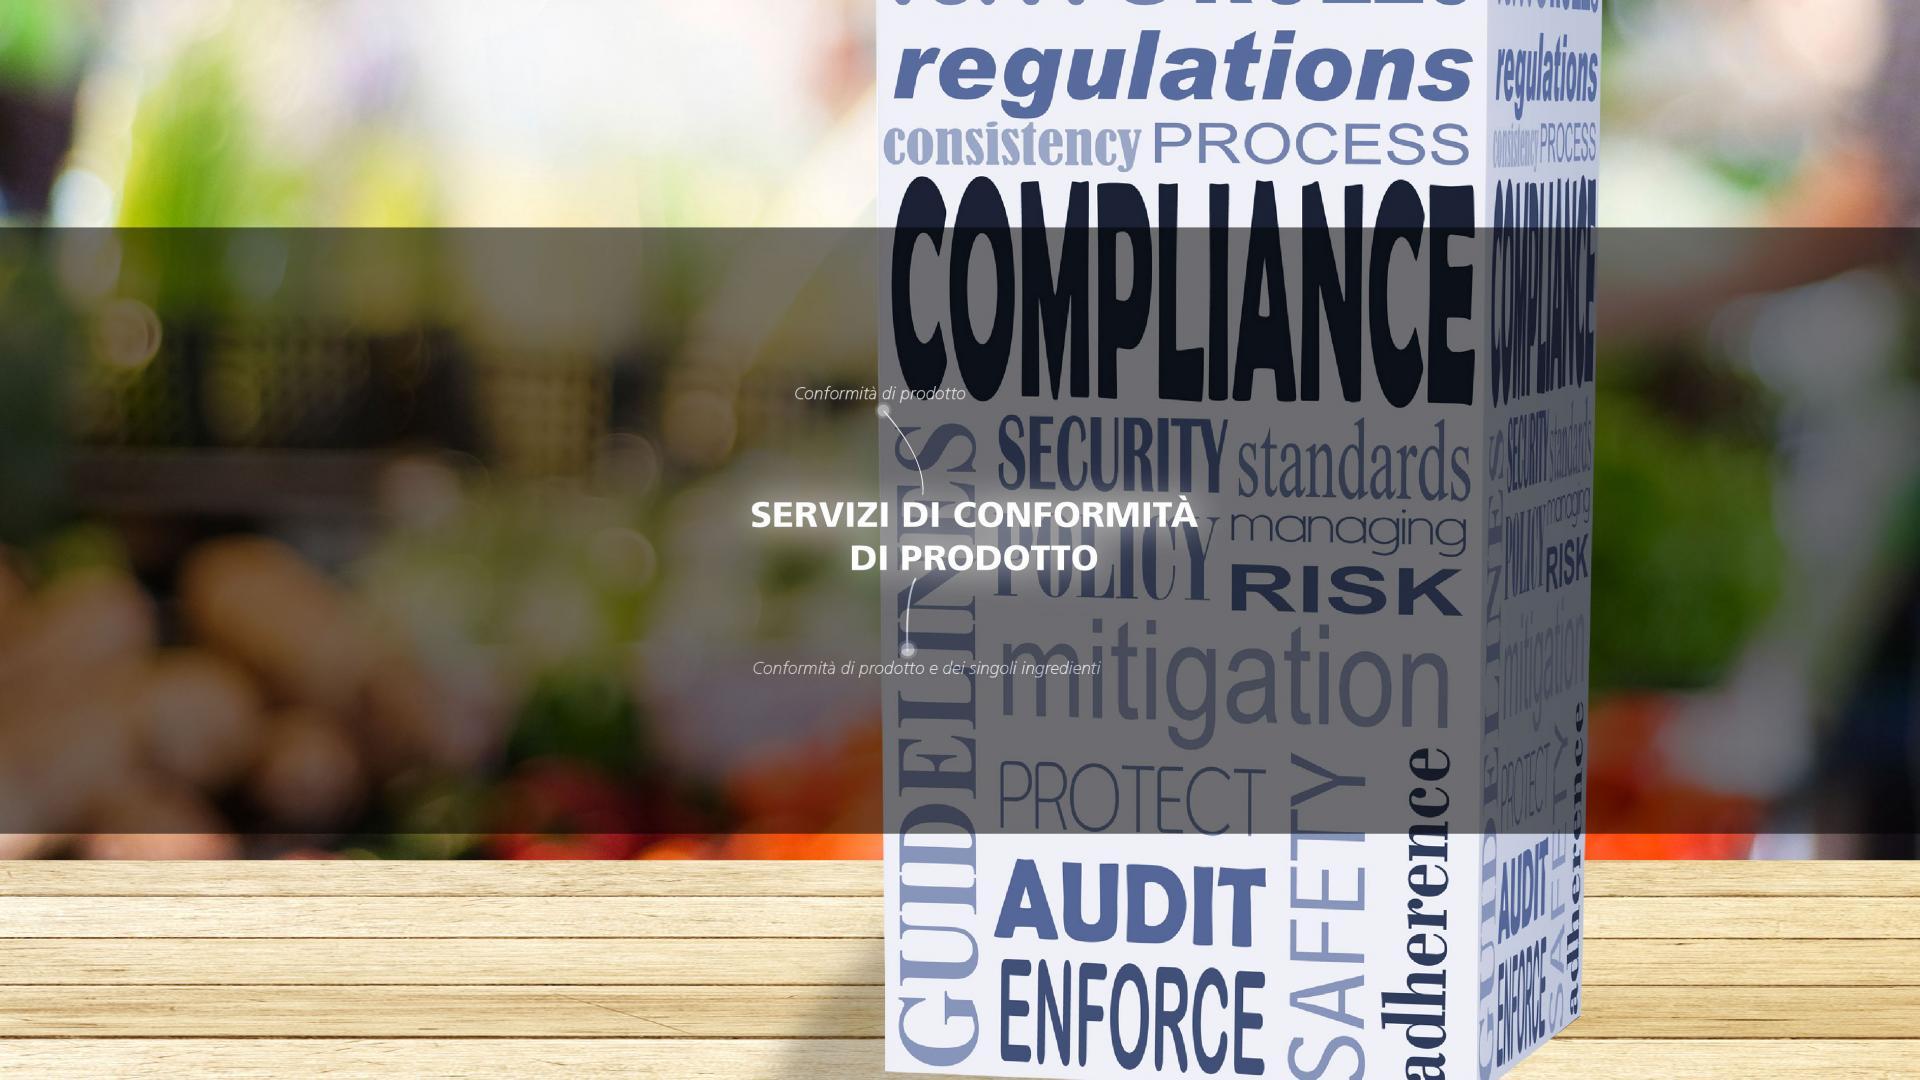 Mérieux NutriSciences-labeling and Regulatory-Conformità di prodotto